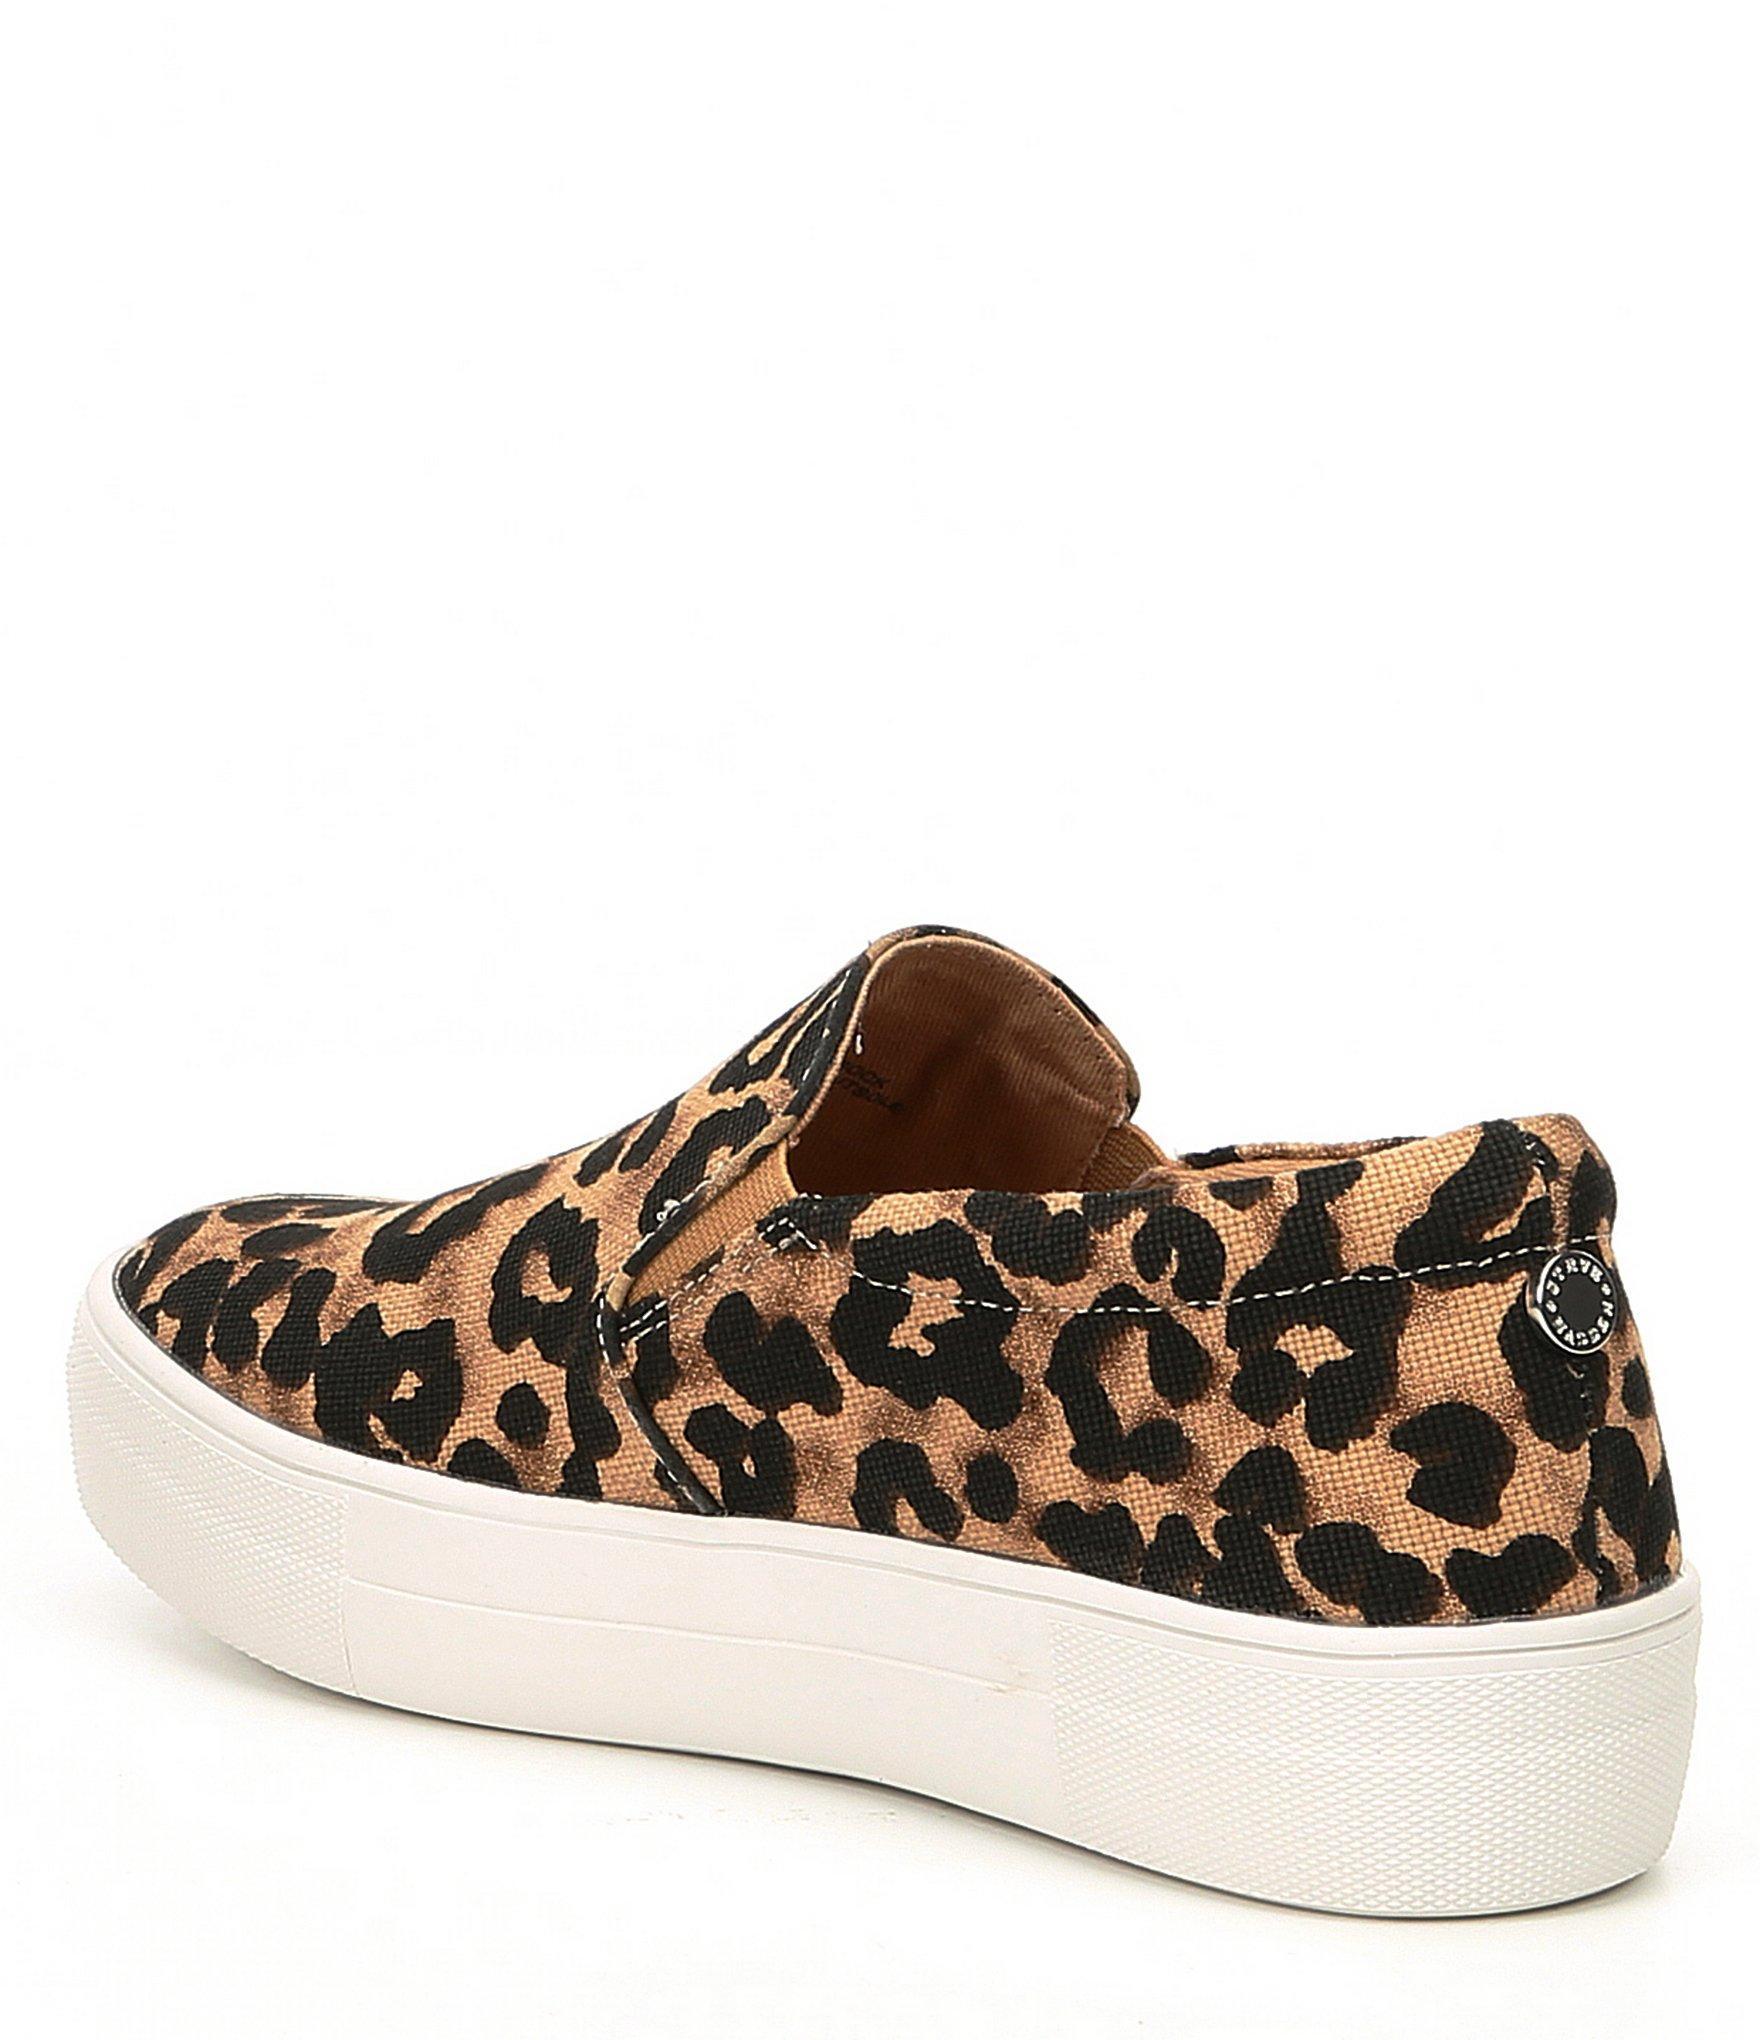 795cd285944 Steve Madden Gills Leopard Print Platform Sneakers in Brown - Lyst